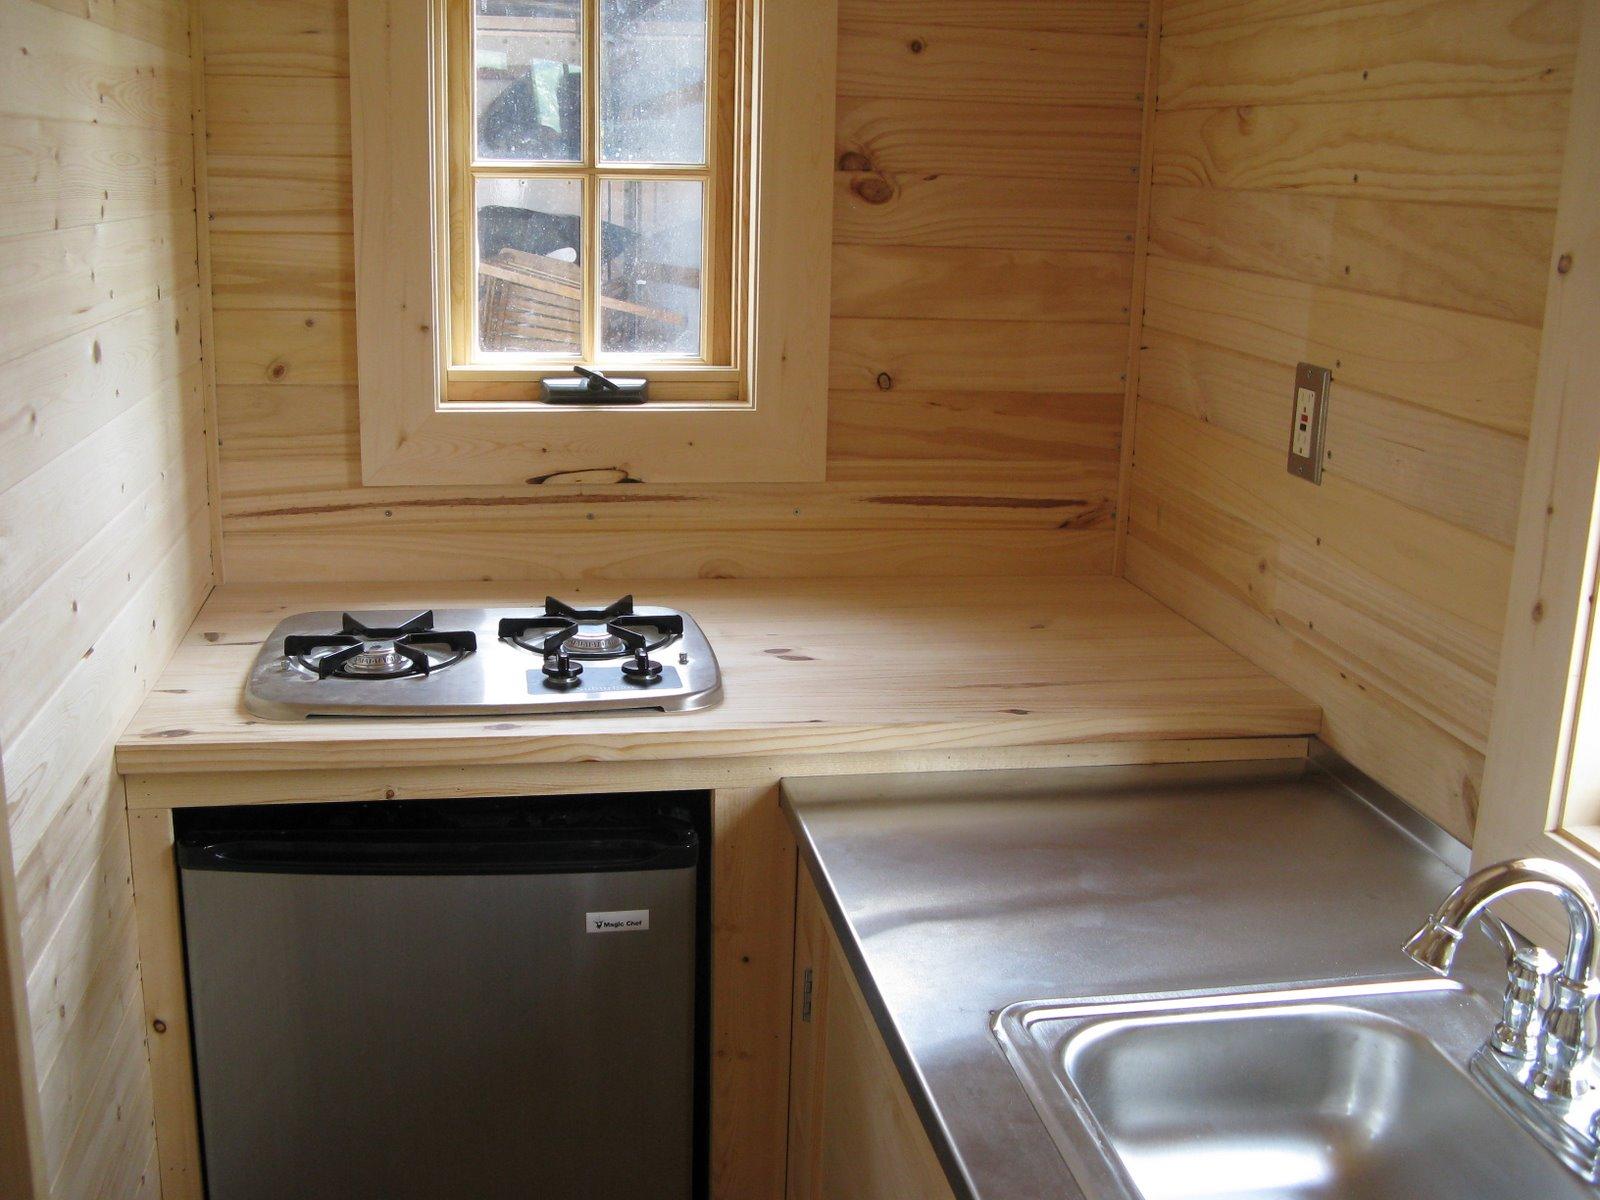 Minimalist Kitchens & Cooking – Part 2